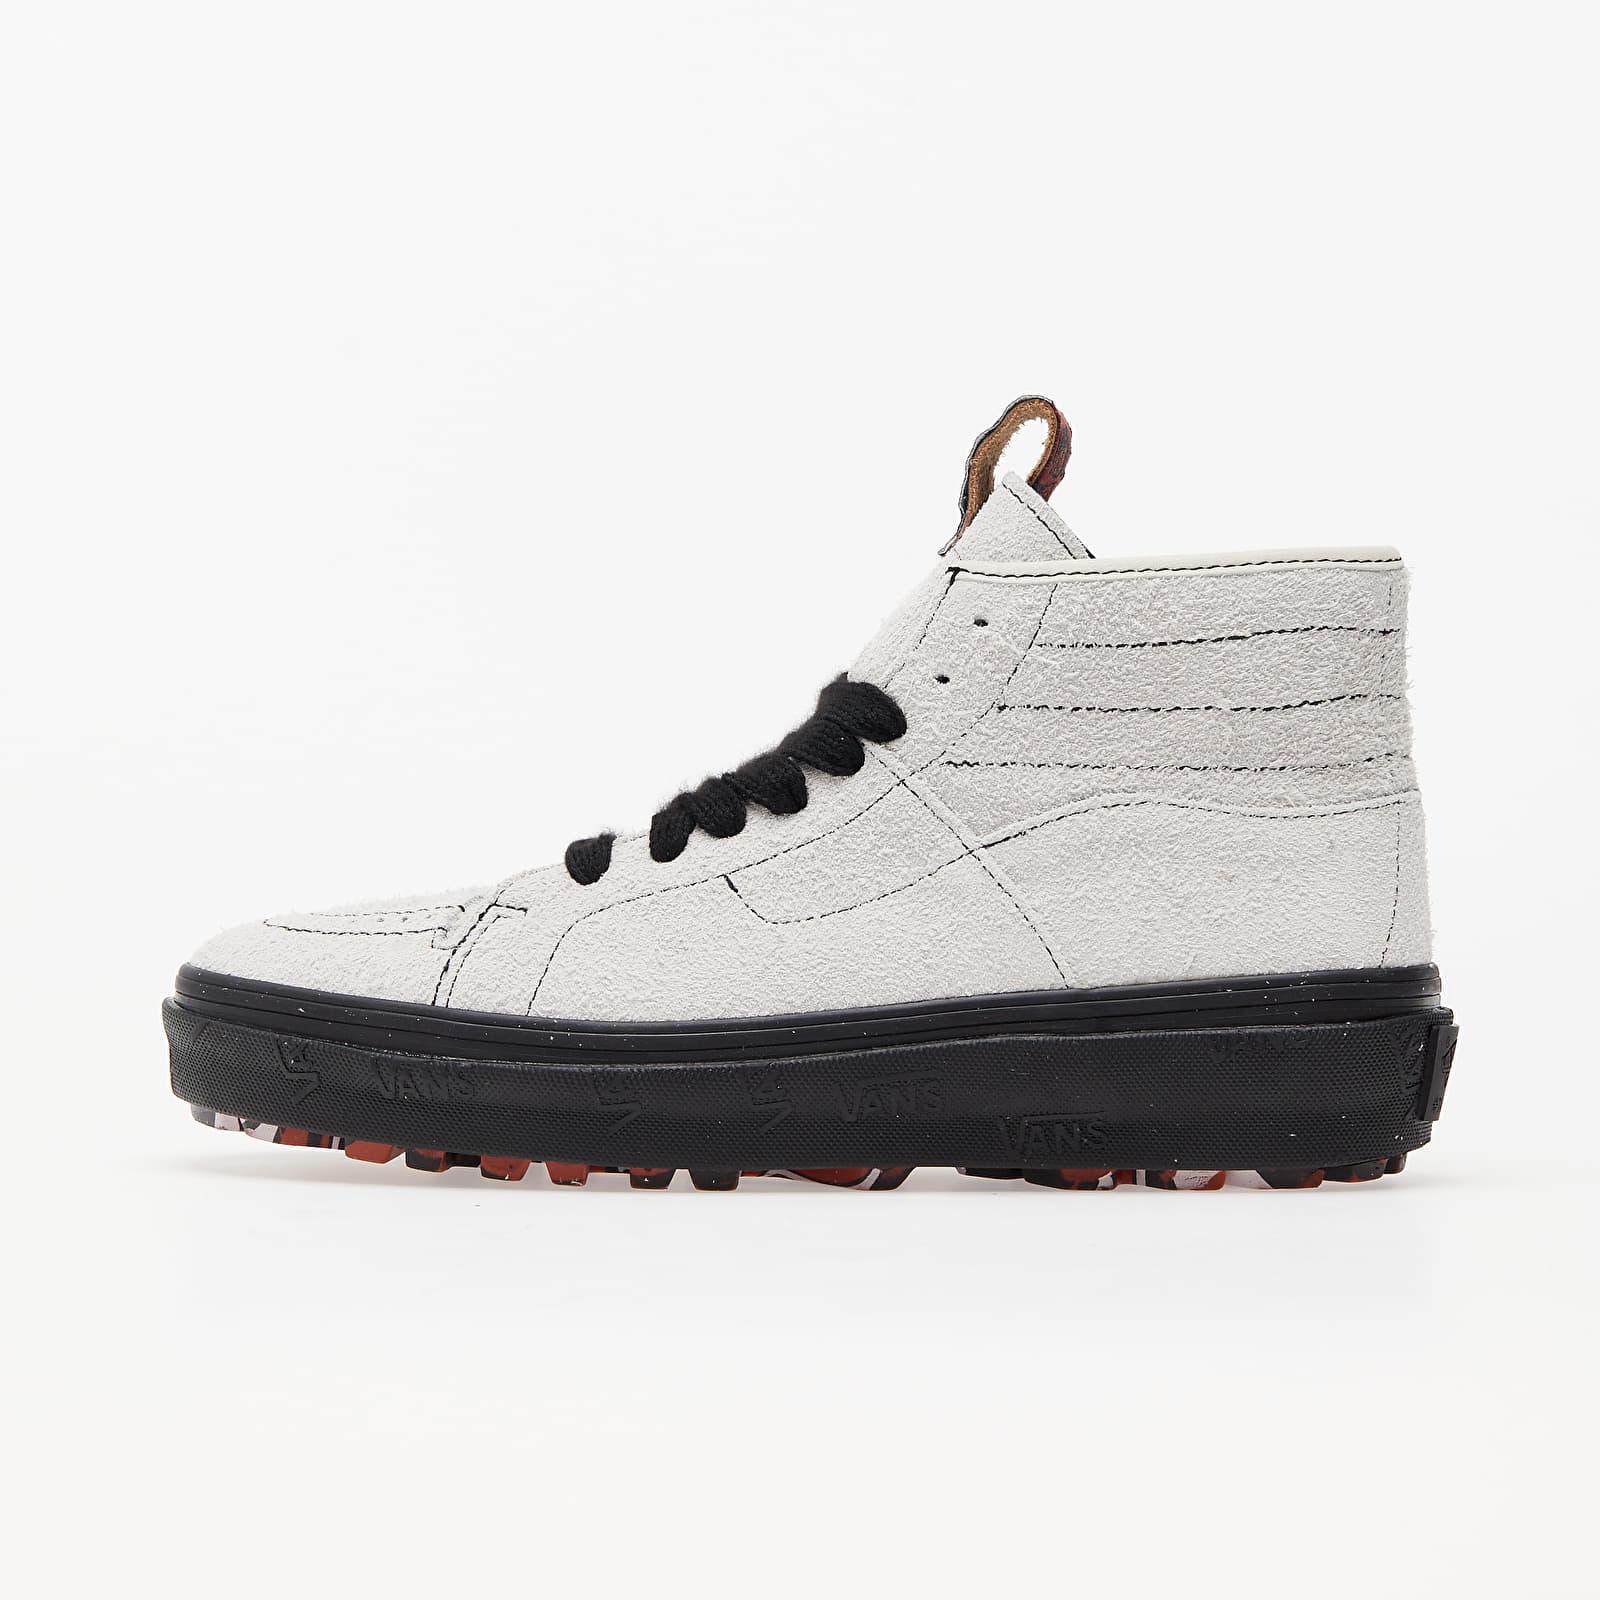 Men's shoes Vans Vans x Taka Hayashi Sk8-Boot LX (Suede) Marshmallow/ Bossa Nova